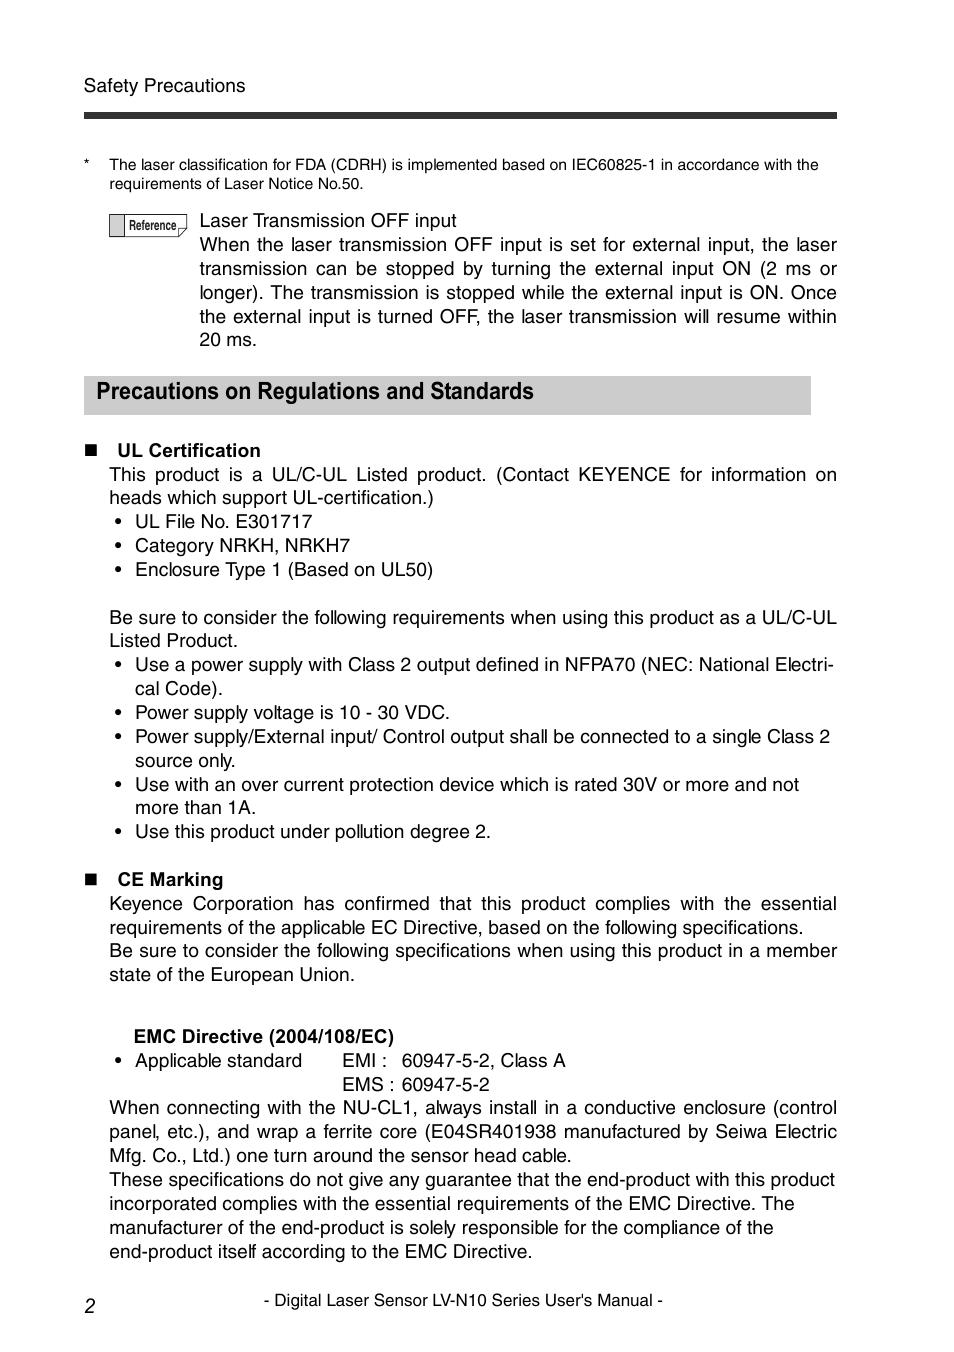 Precautions on regulations and standards | KEYENCE LV-N10